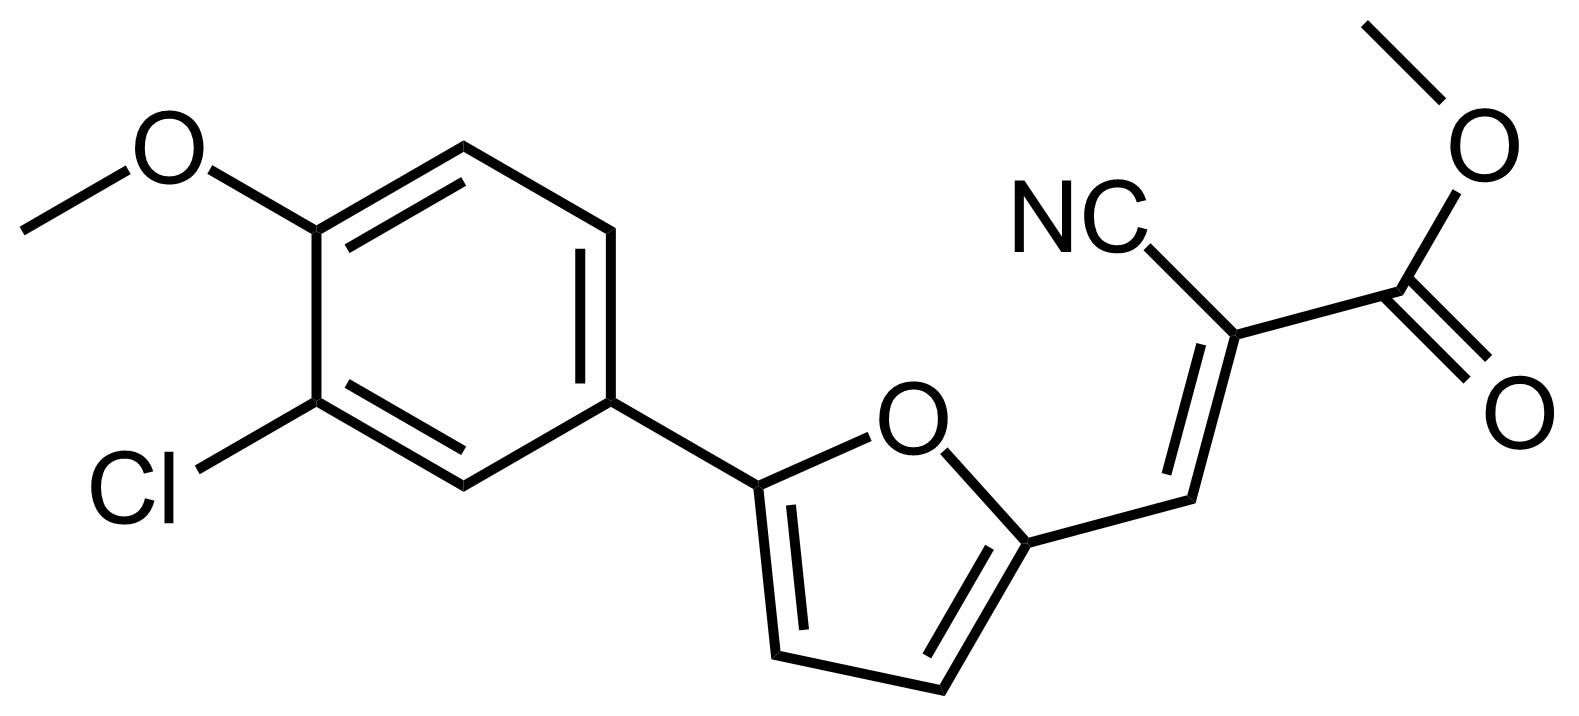 Structure of (E)-Methyl 3-(5-(3-chloro-4-methoxyphenyl)furan-2-yl)-2-cyanoacrylate